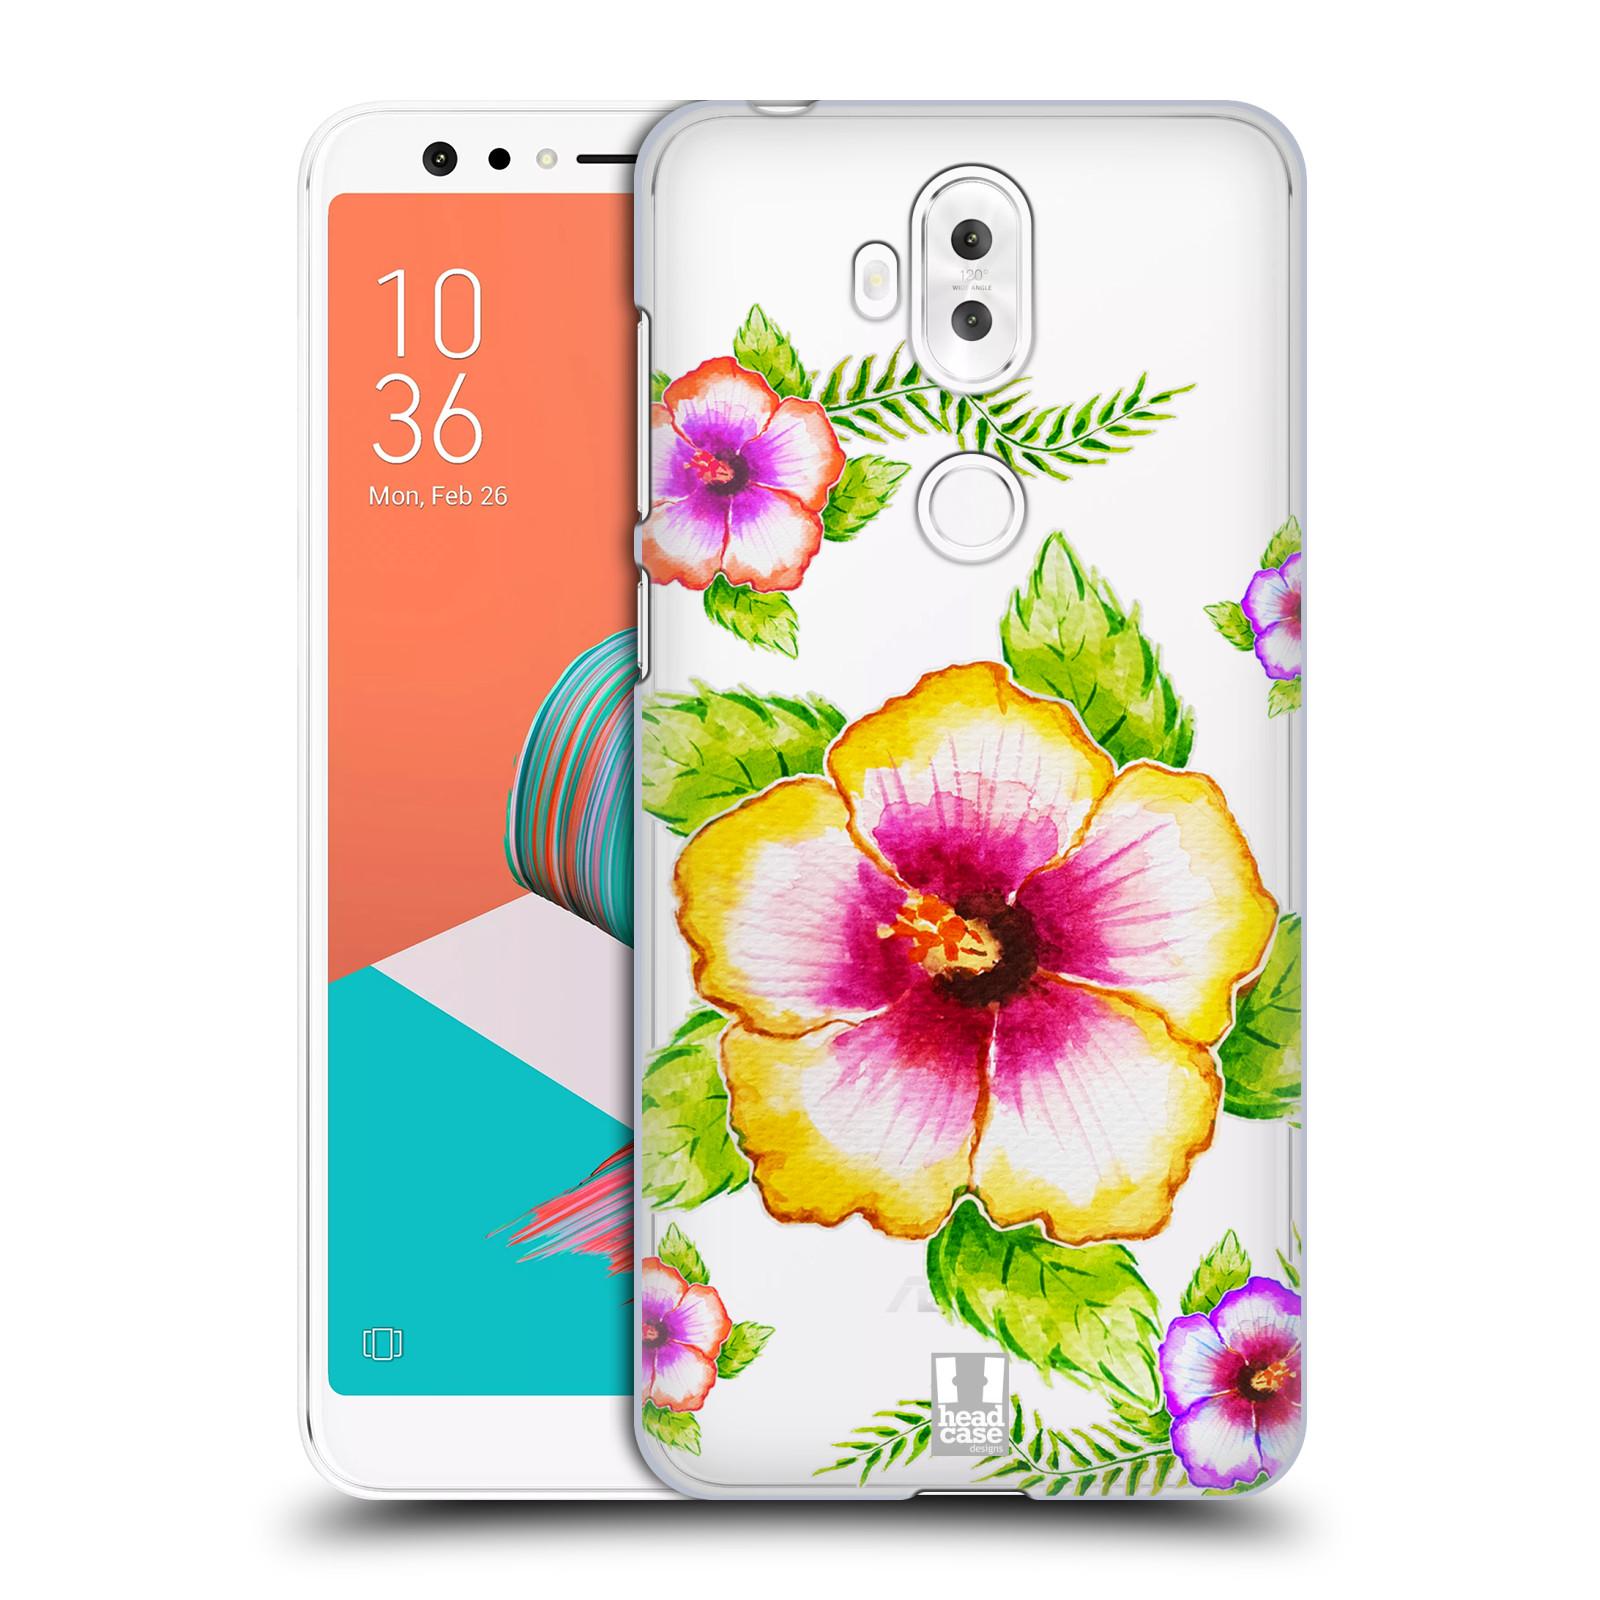 HEAD CASE plastový obal na mobil Asus Zenfone 5 LITE ZC600KL Květina Ibišek vodní barvy